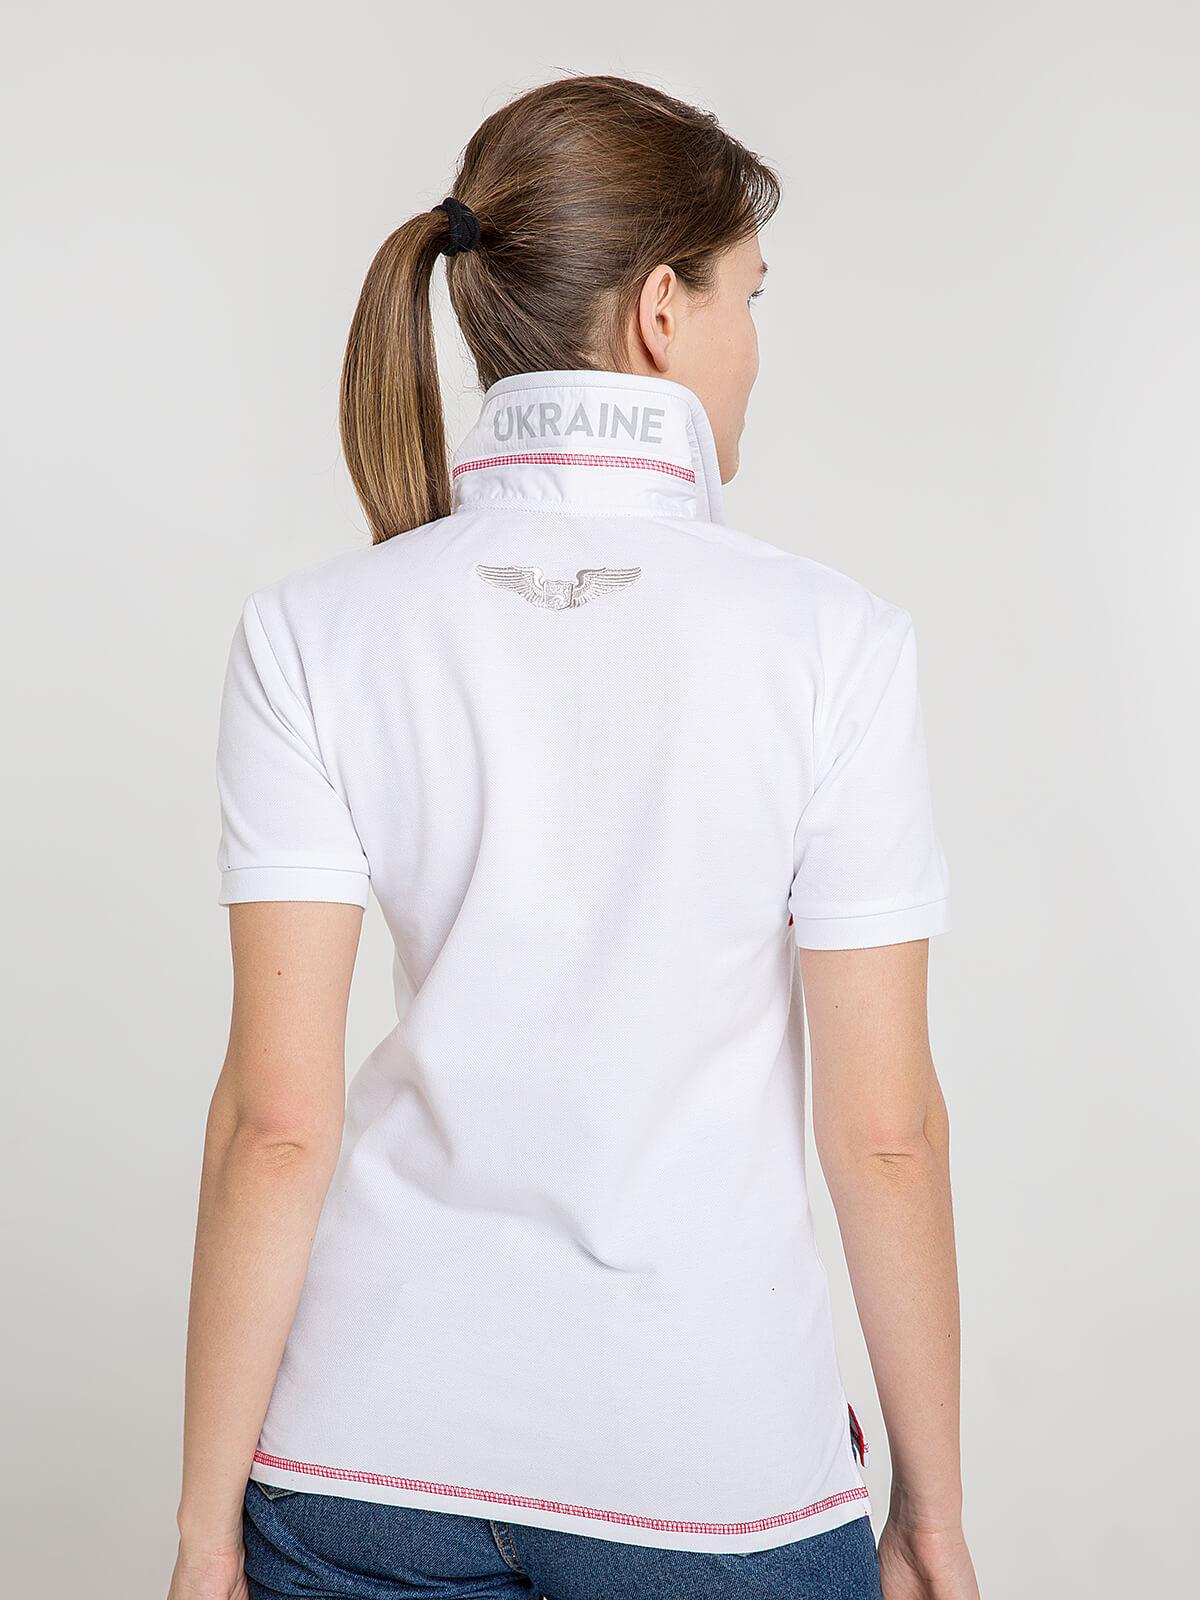 Women's Polo Shirt Wings. Color white.  Pique fabric: 100% cotton.